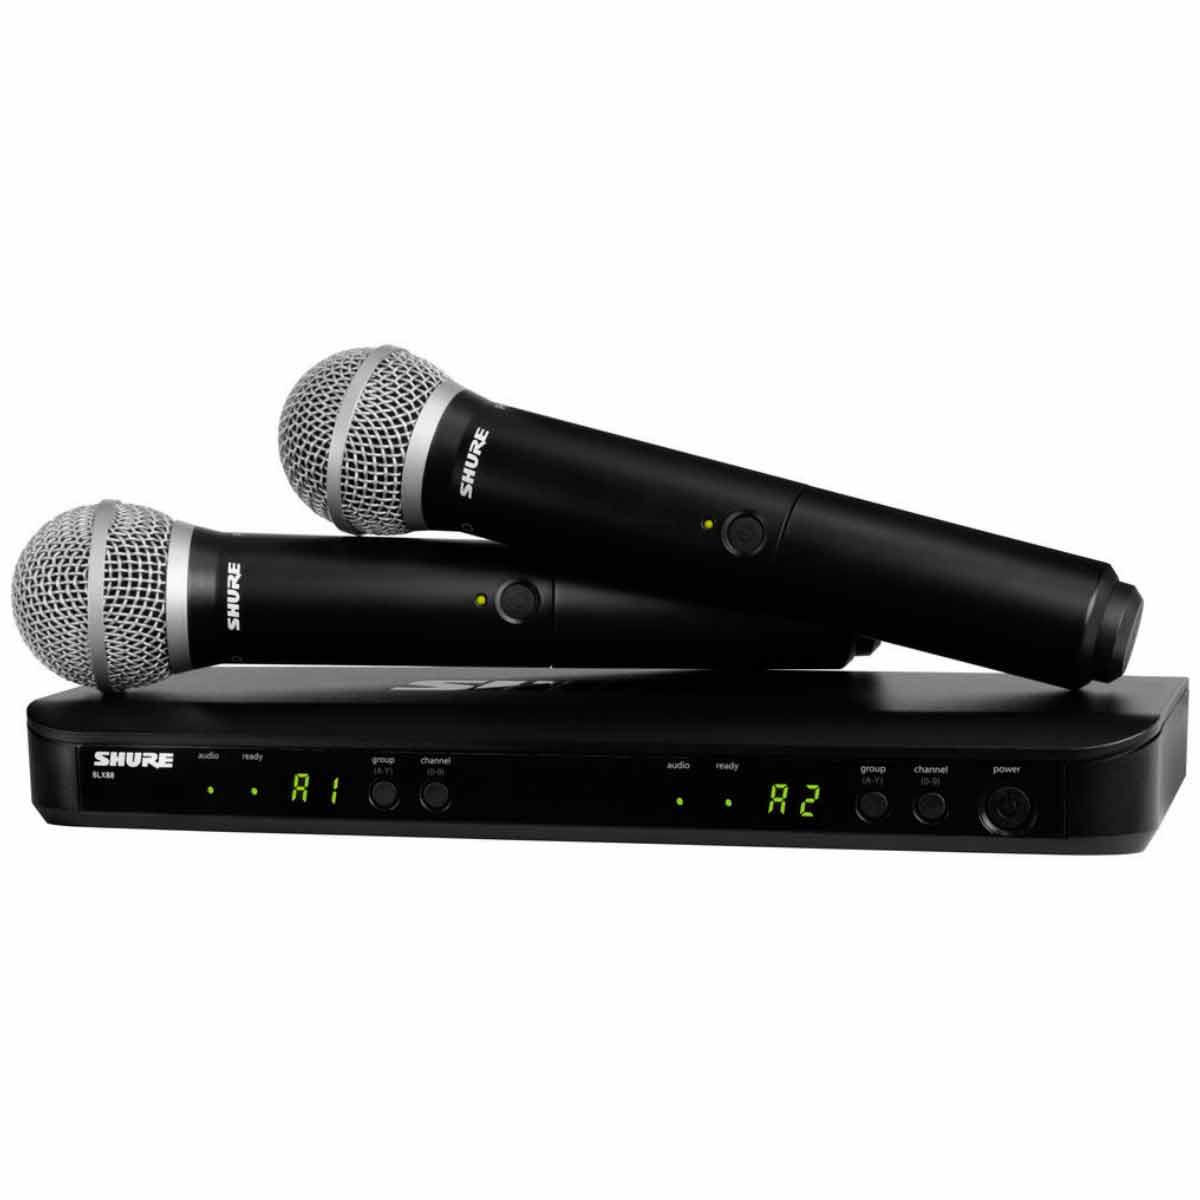 BLX288BRPG58 - Microfone s/ Fio de M�o Duplo BLX 288BR PG58 - Shure